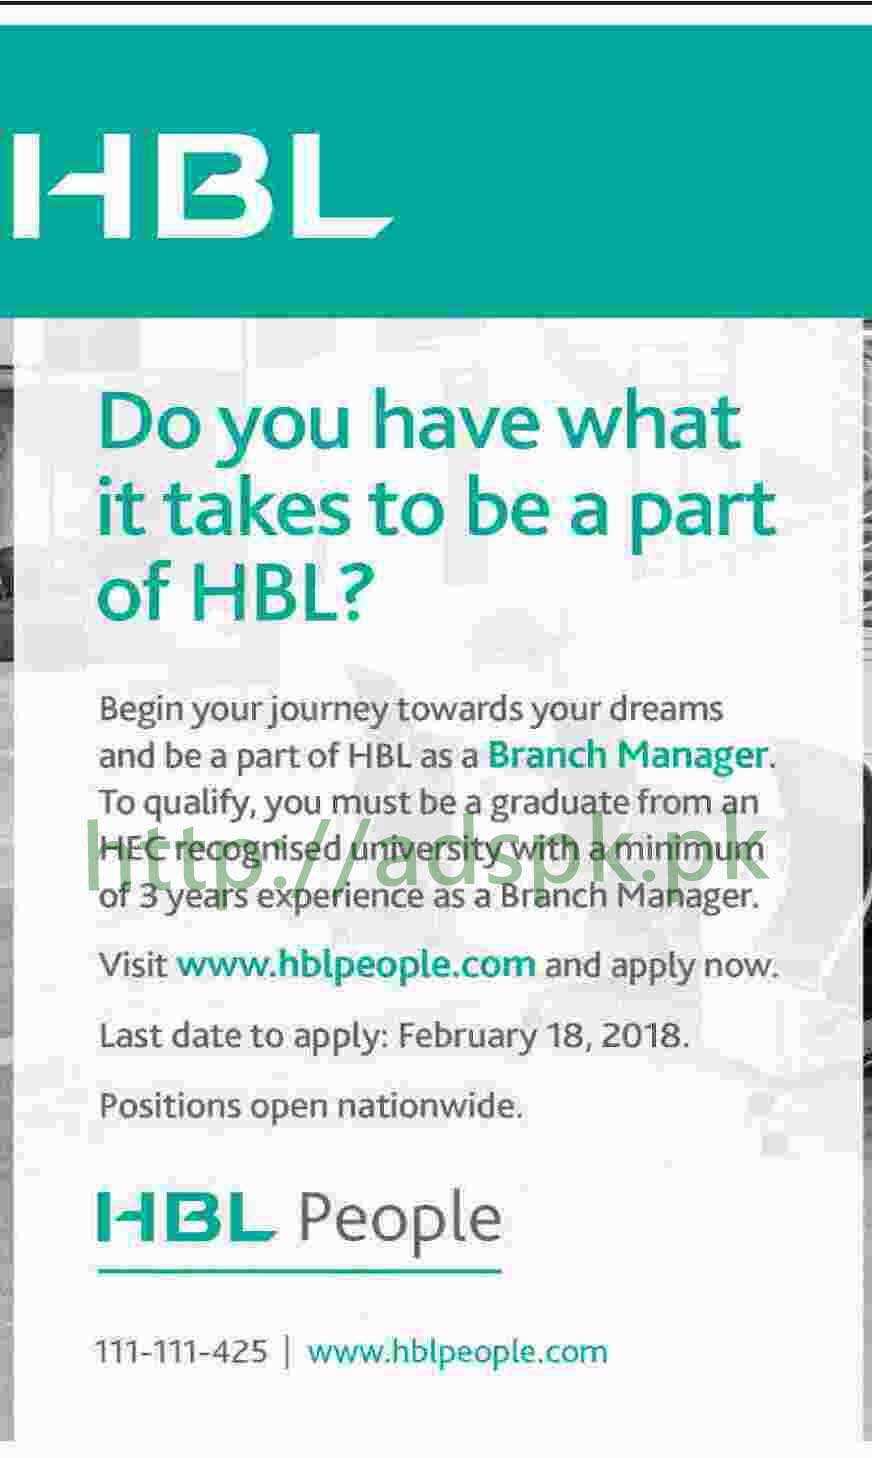 habib bank limited jobs online apply